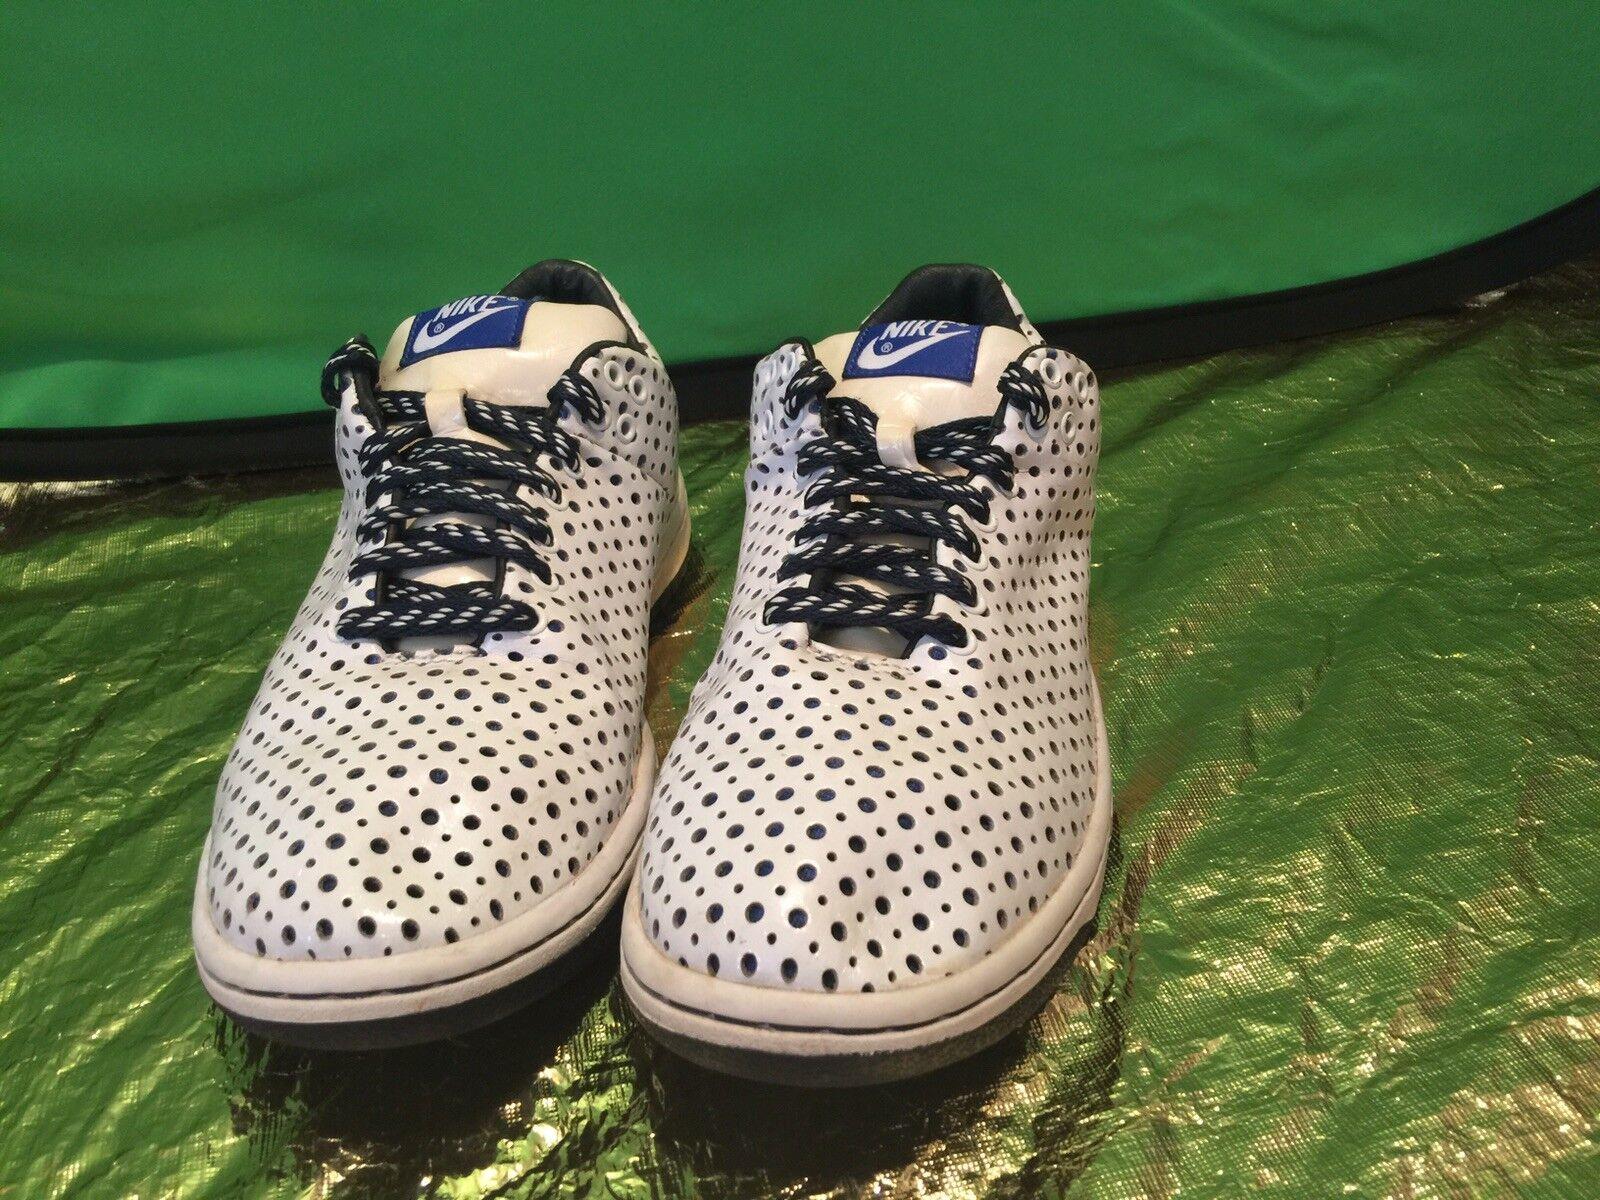 Nike Zoom Turnschuhe damen Blau Polka Dot Nike Weiß & Blau Größe 9 Pre-Owned Rare